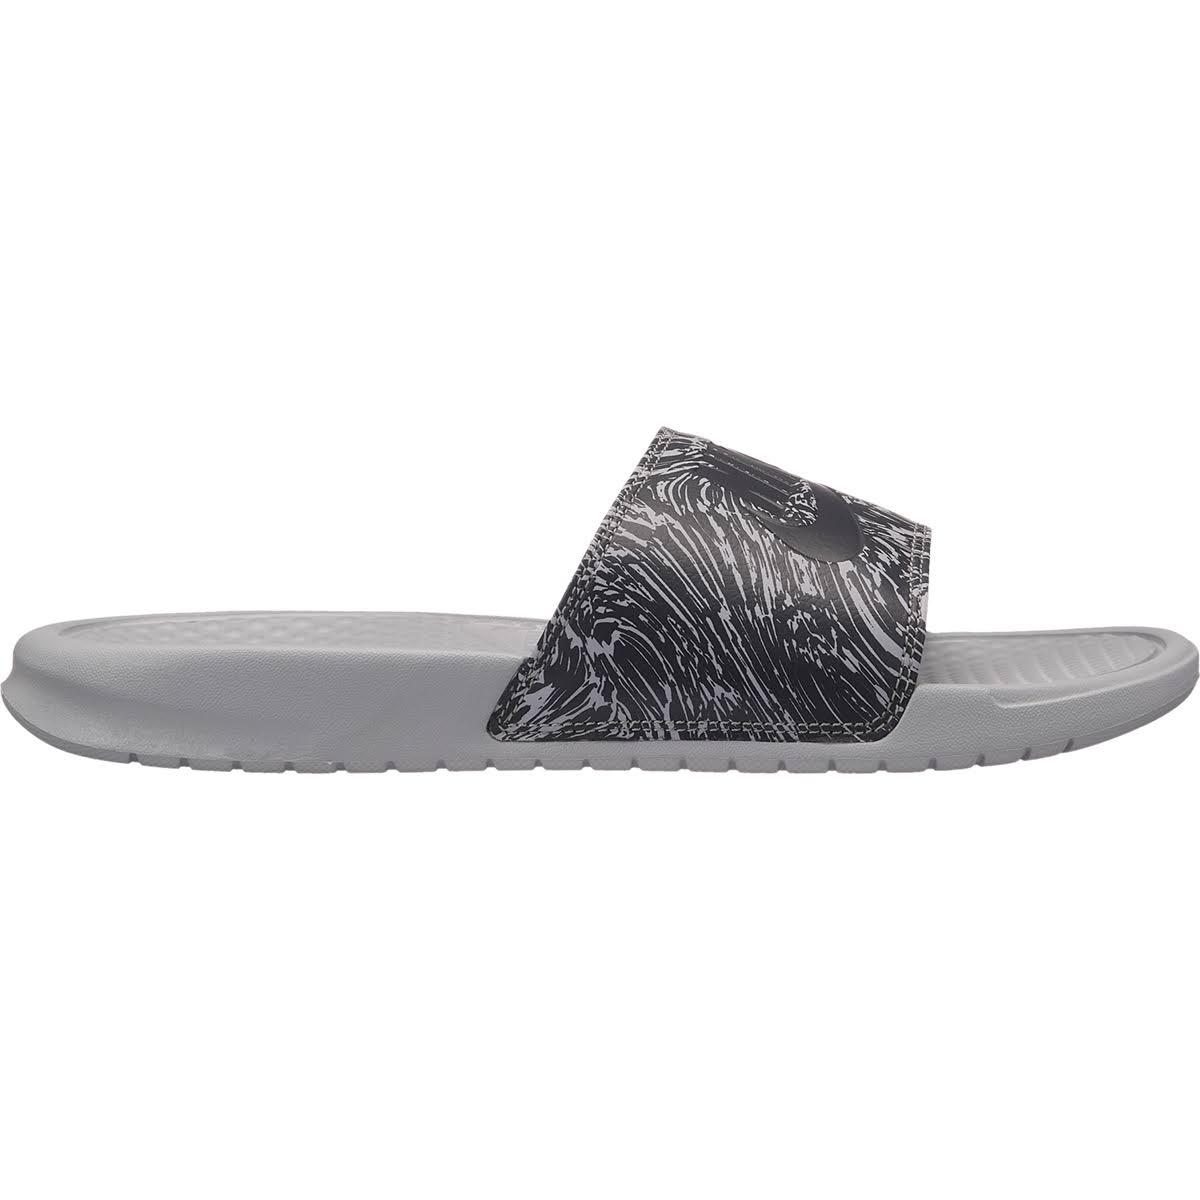 631261005 Hombre Wolf Benassi Gris Nike Para Antracita Slide Jdi XnRggOx68